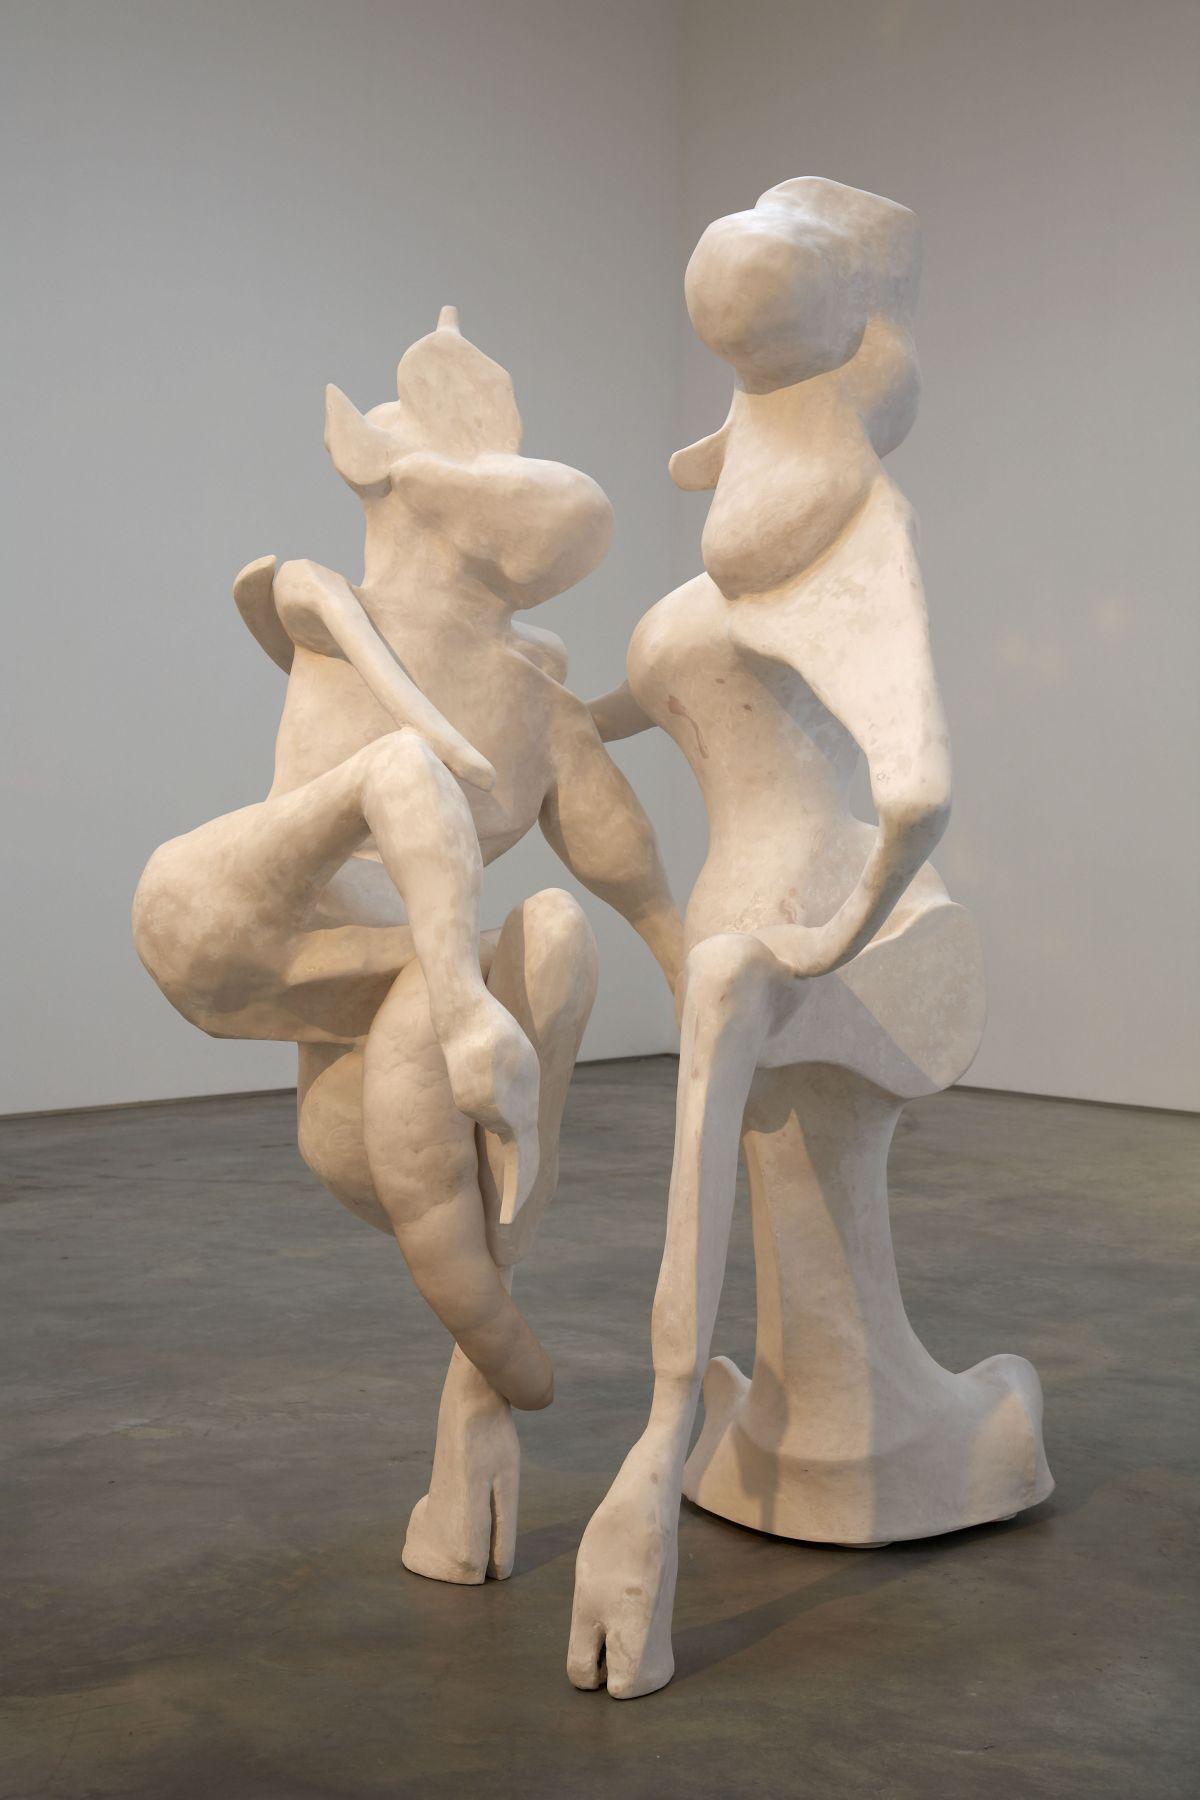 sculptures of two dancing satyrs by rachel feinstein